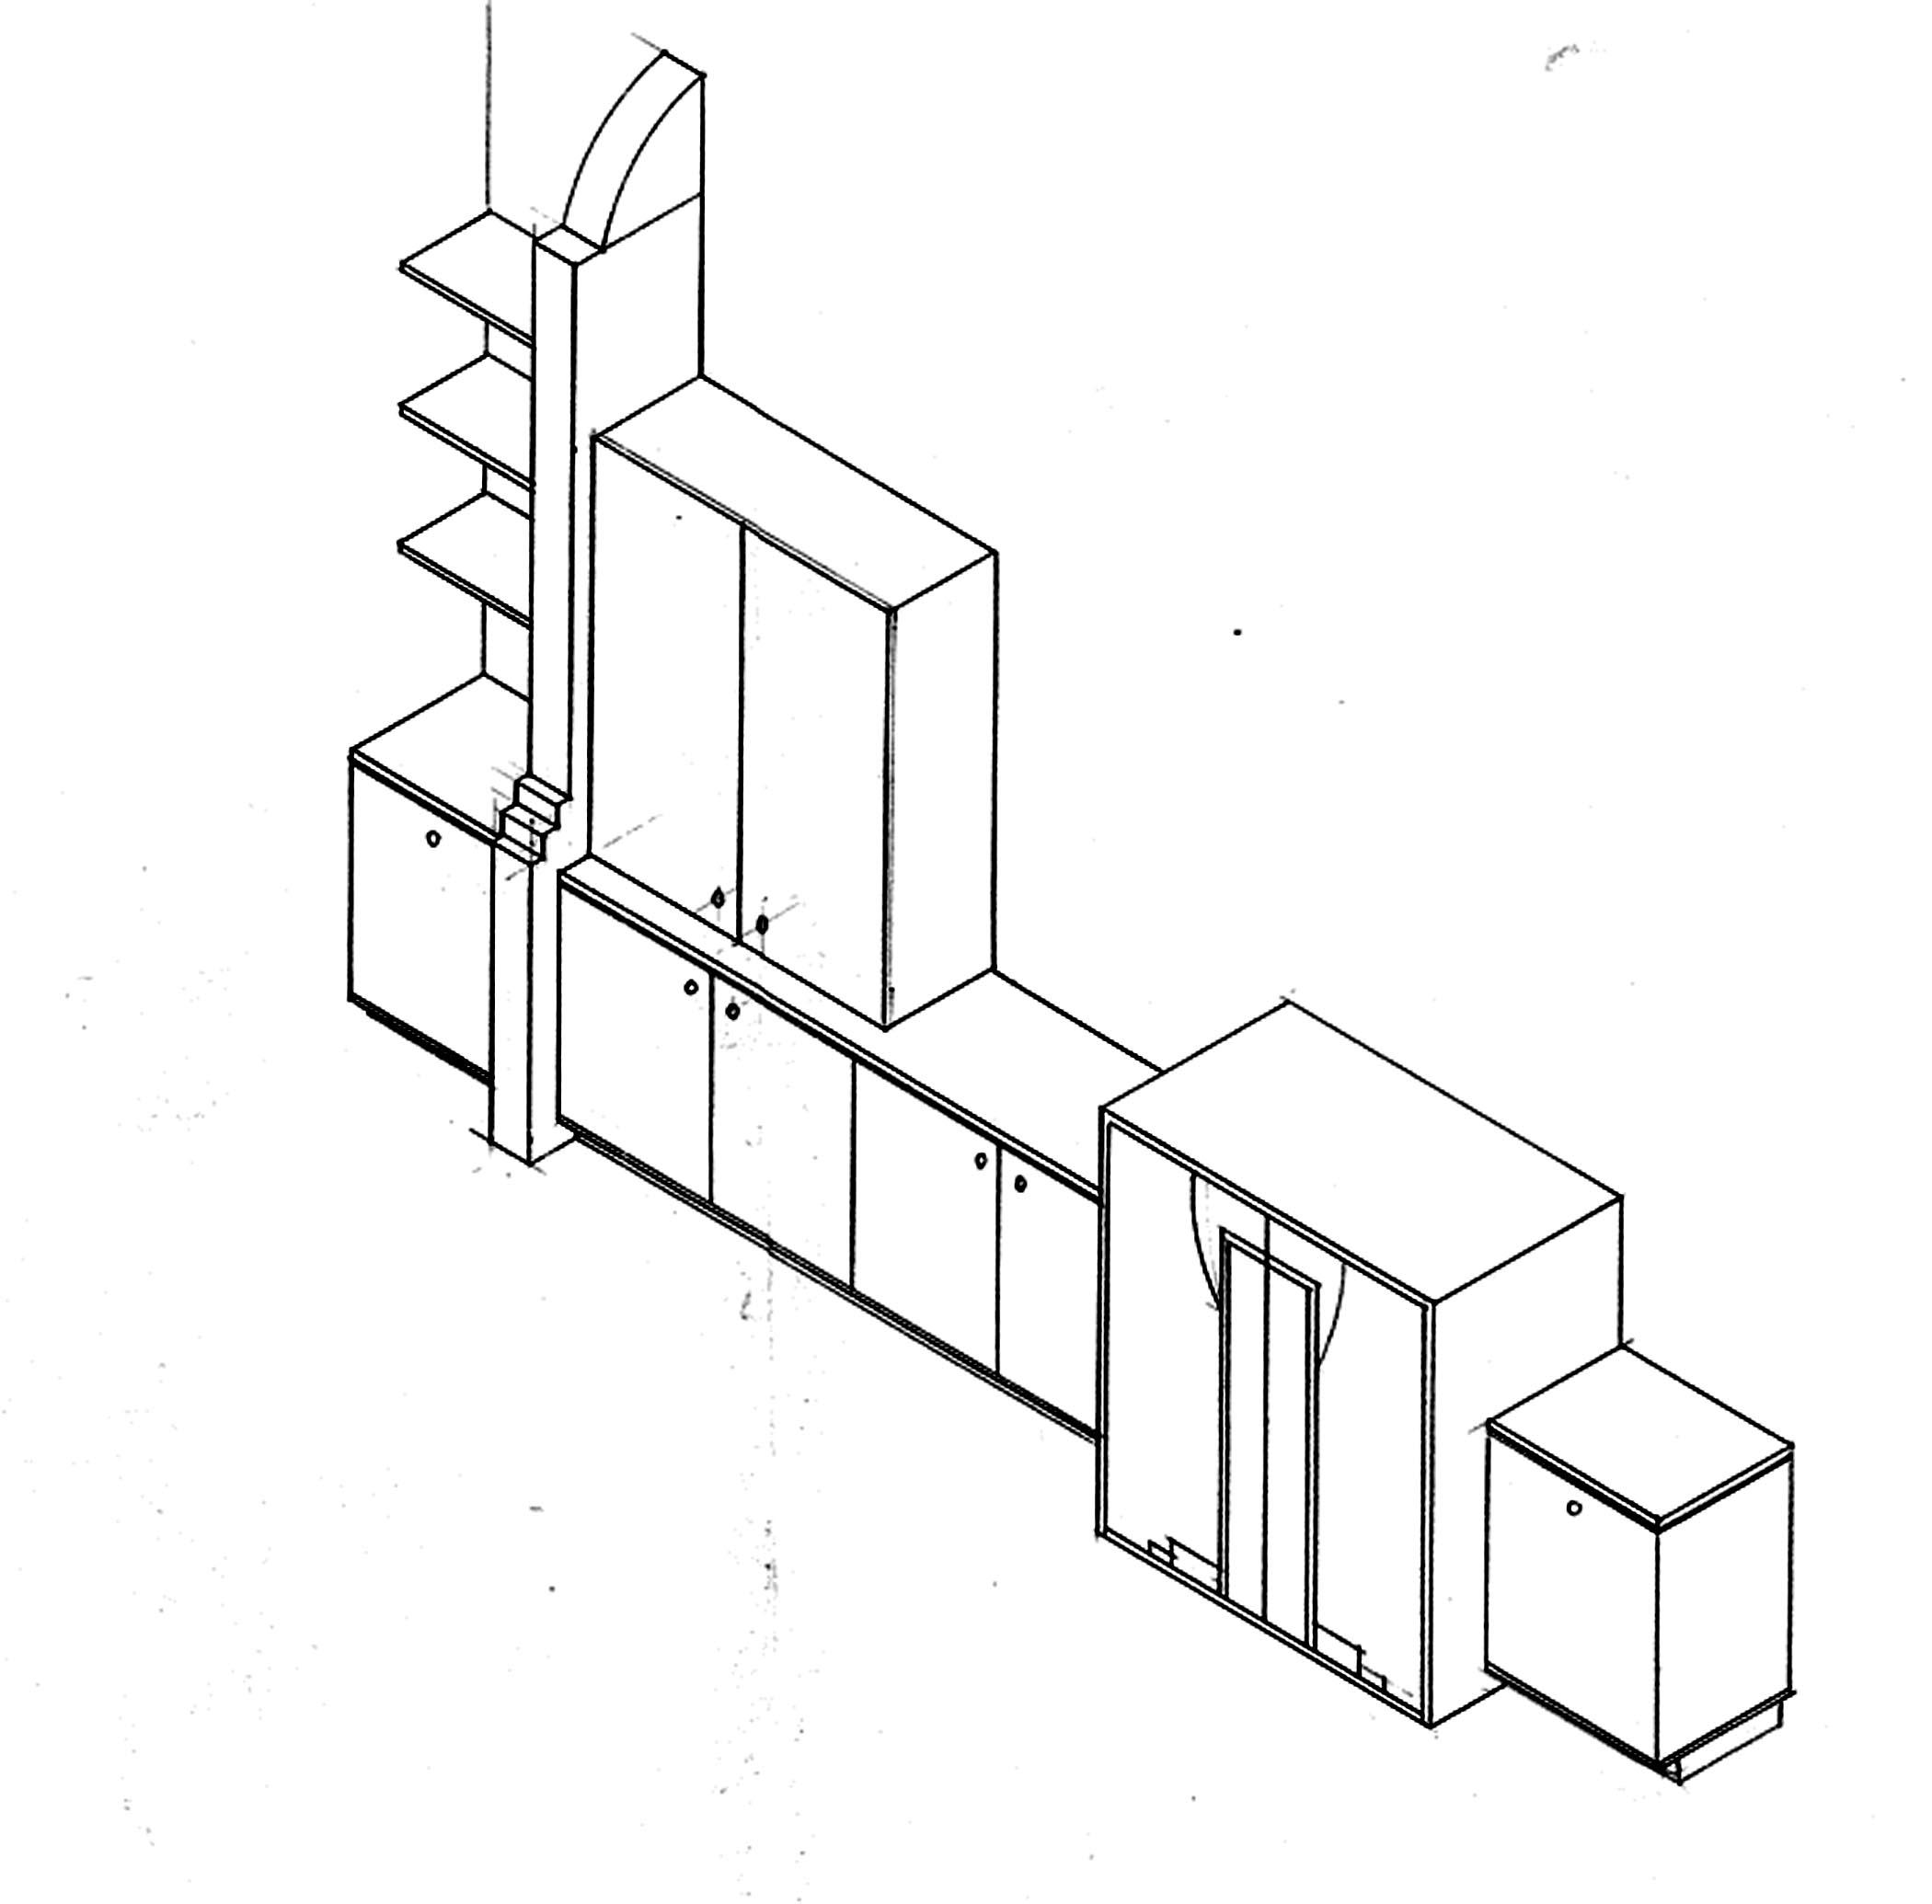 I Design Furniture And Cabinet Design Services